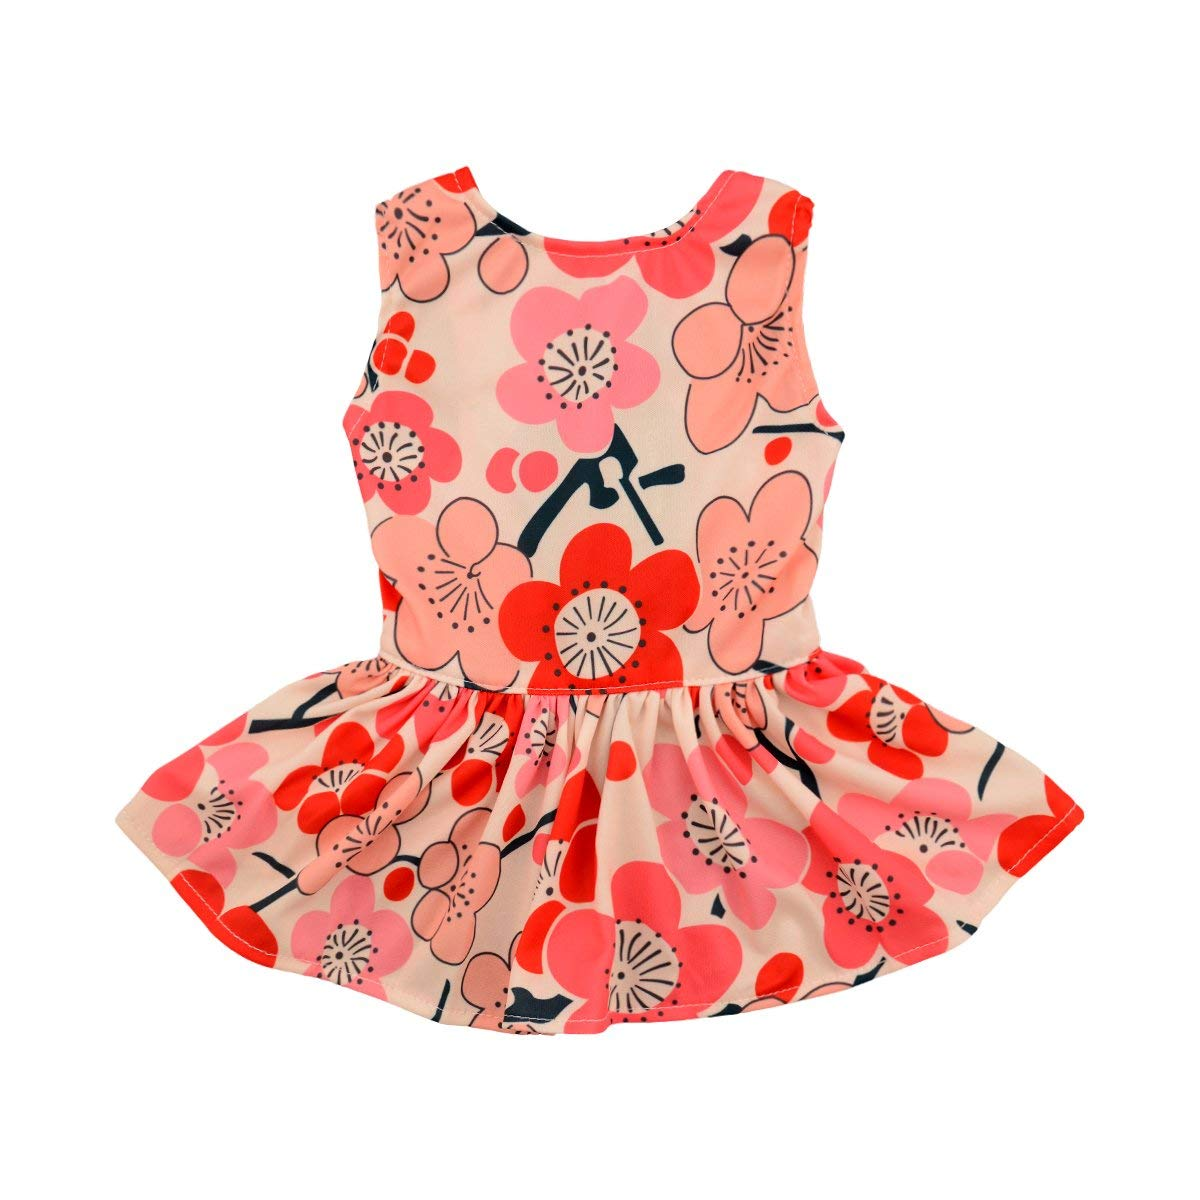 CuteBone Dog Dress Dog Dresses for Small Dogs Doggie Sundress Pet Clothes Dogs Princess Dresses